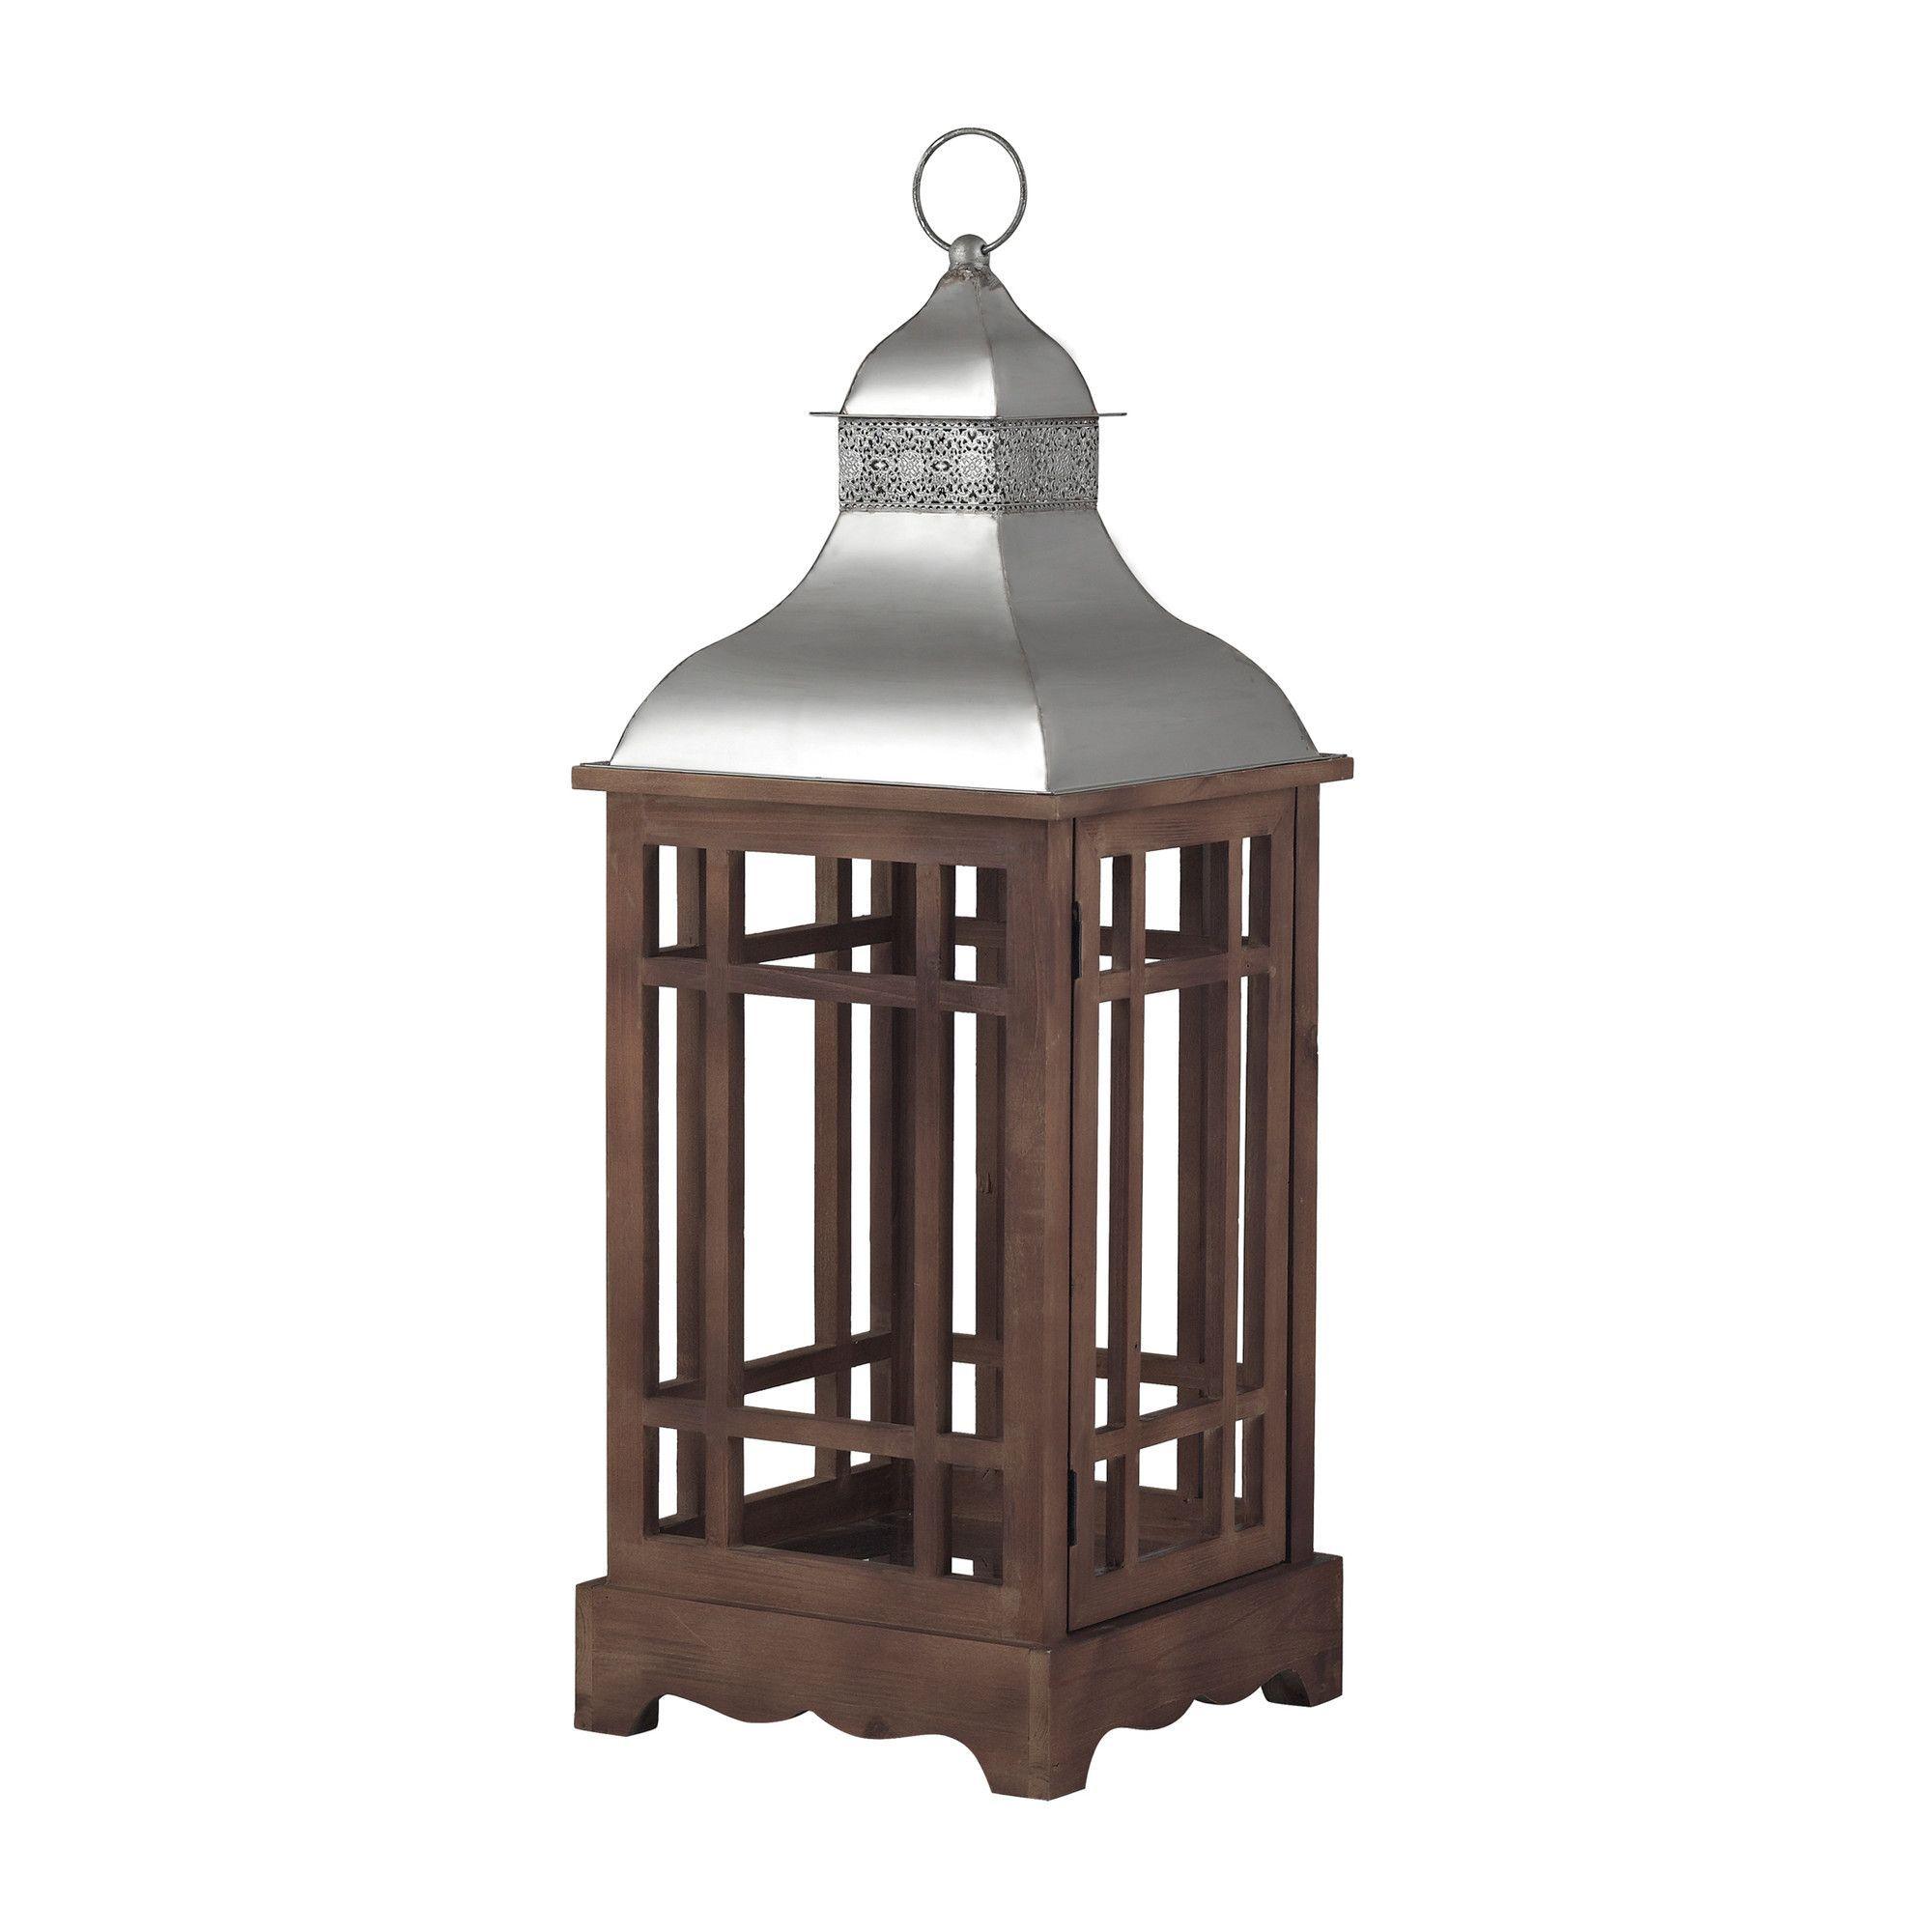 Poynton outdoor wall lantern products pinterest outdoor wall